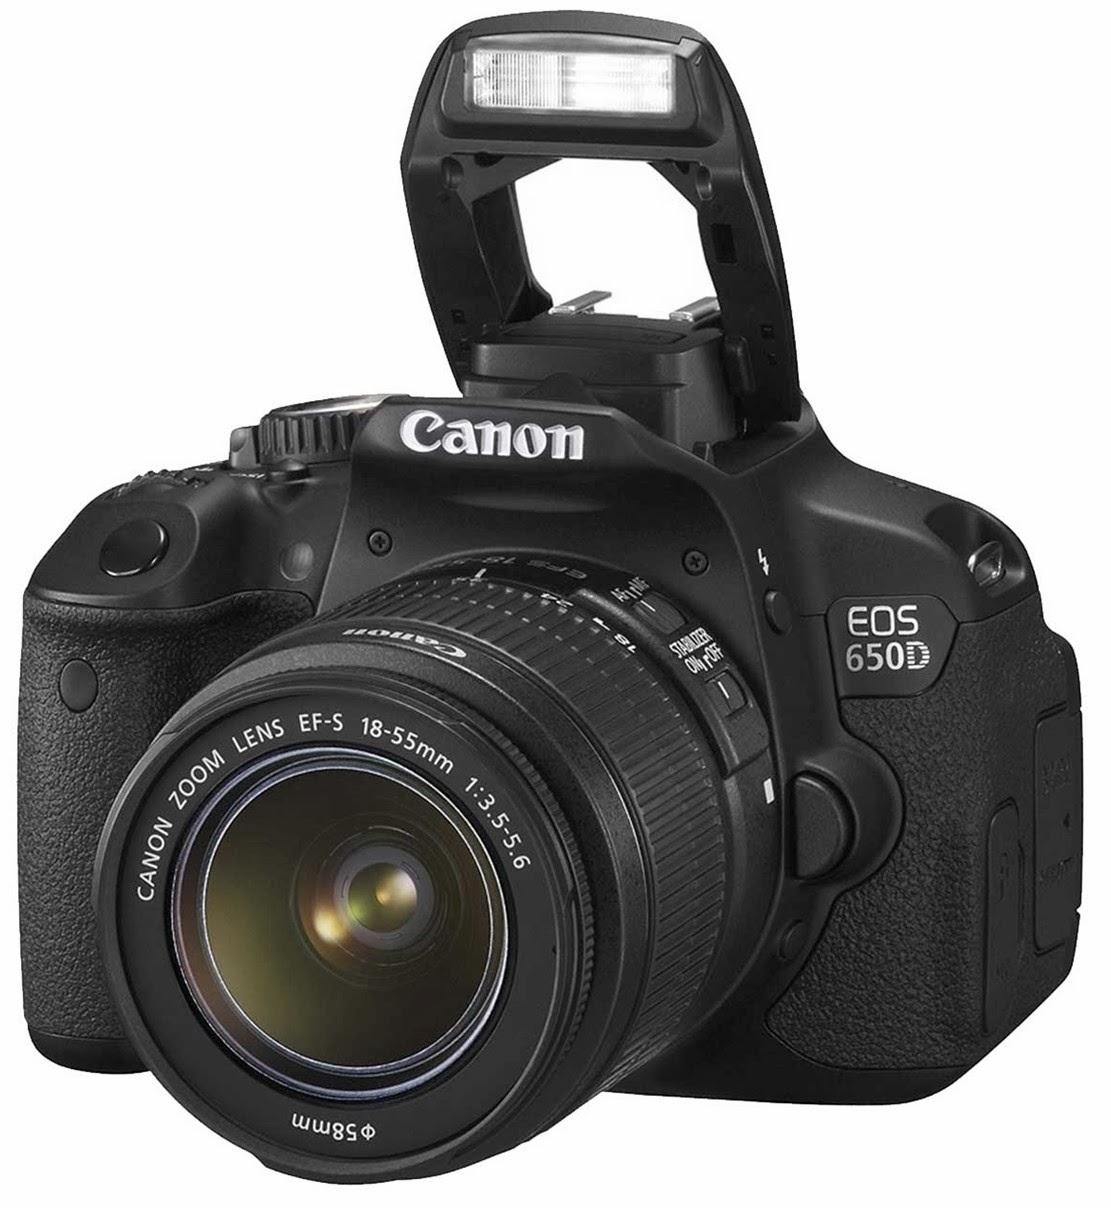 CANON EOS-650D DSLR FOTOĞRAF MAKİNESİ